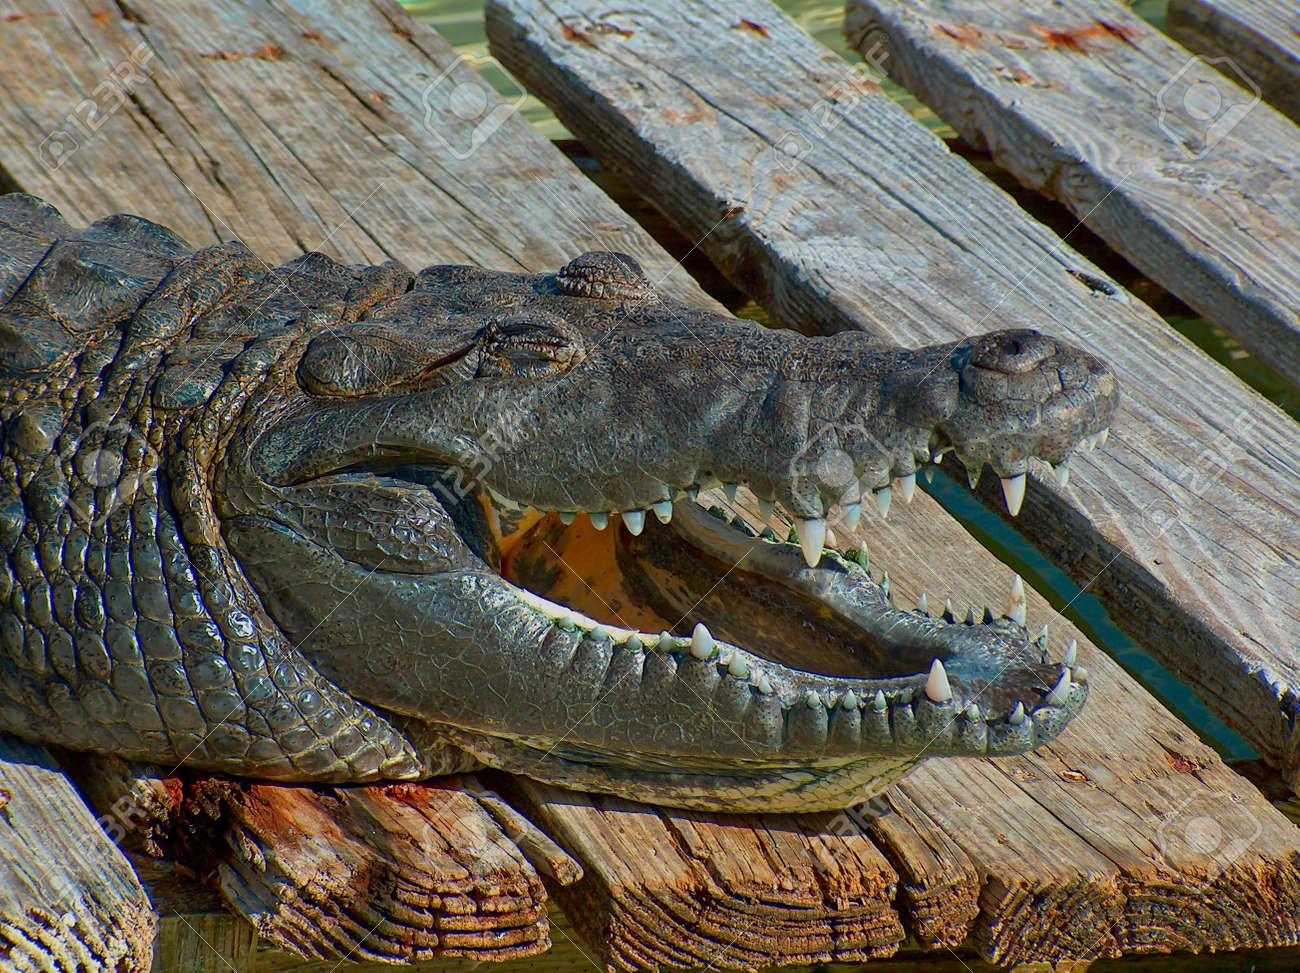 6006597-Smiling-Alligator-Stock-Photo.jpg